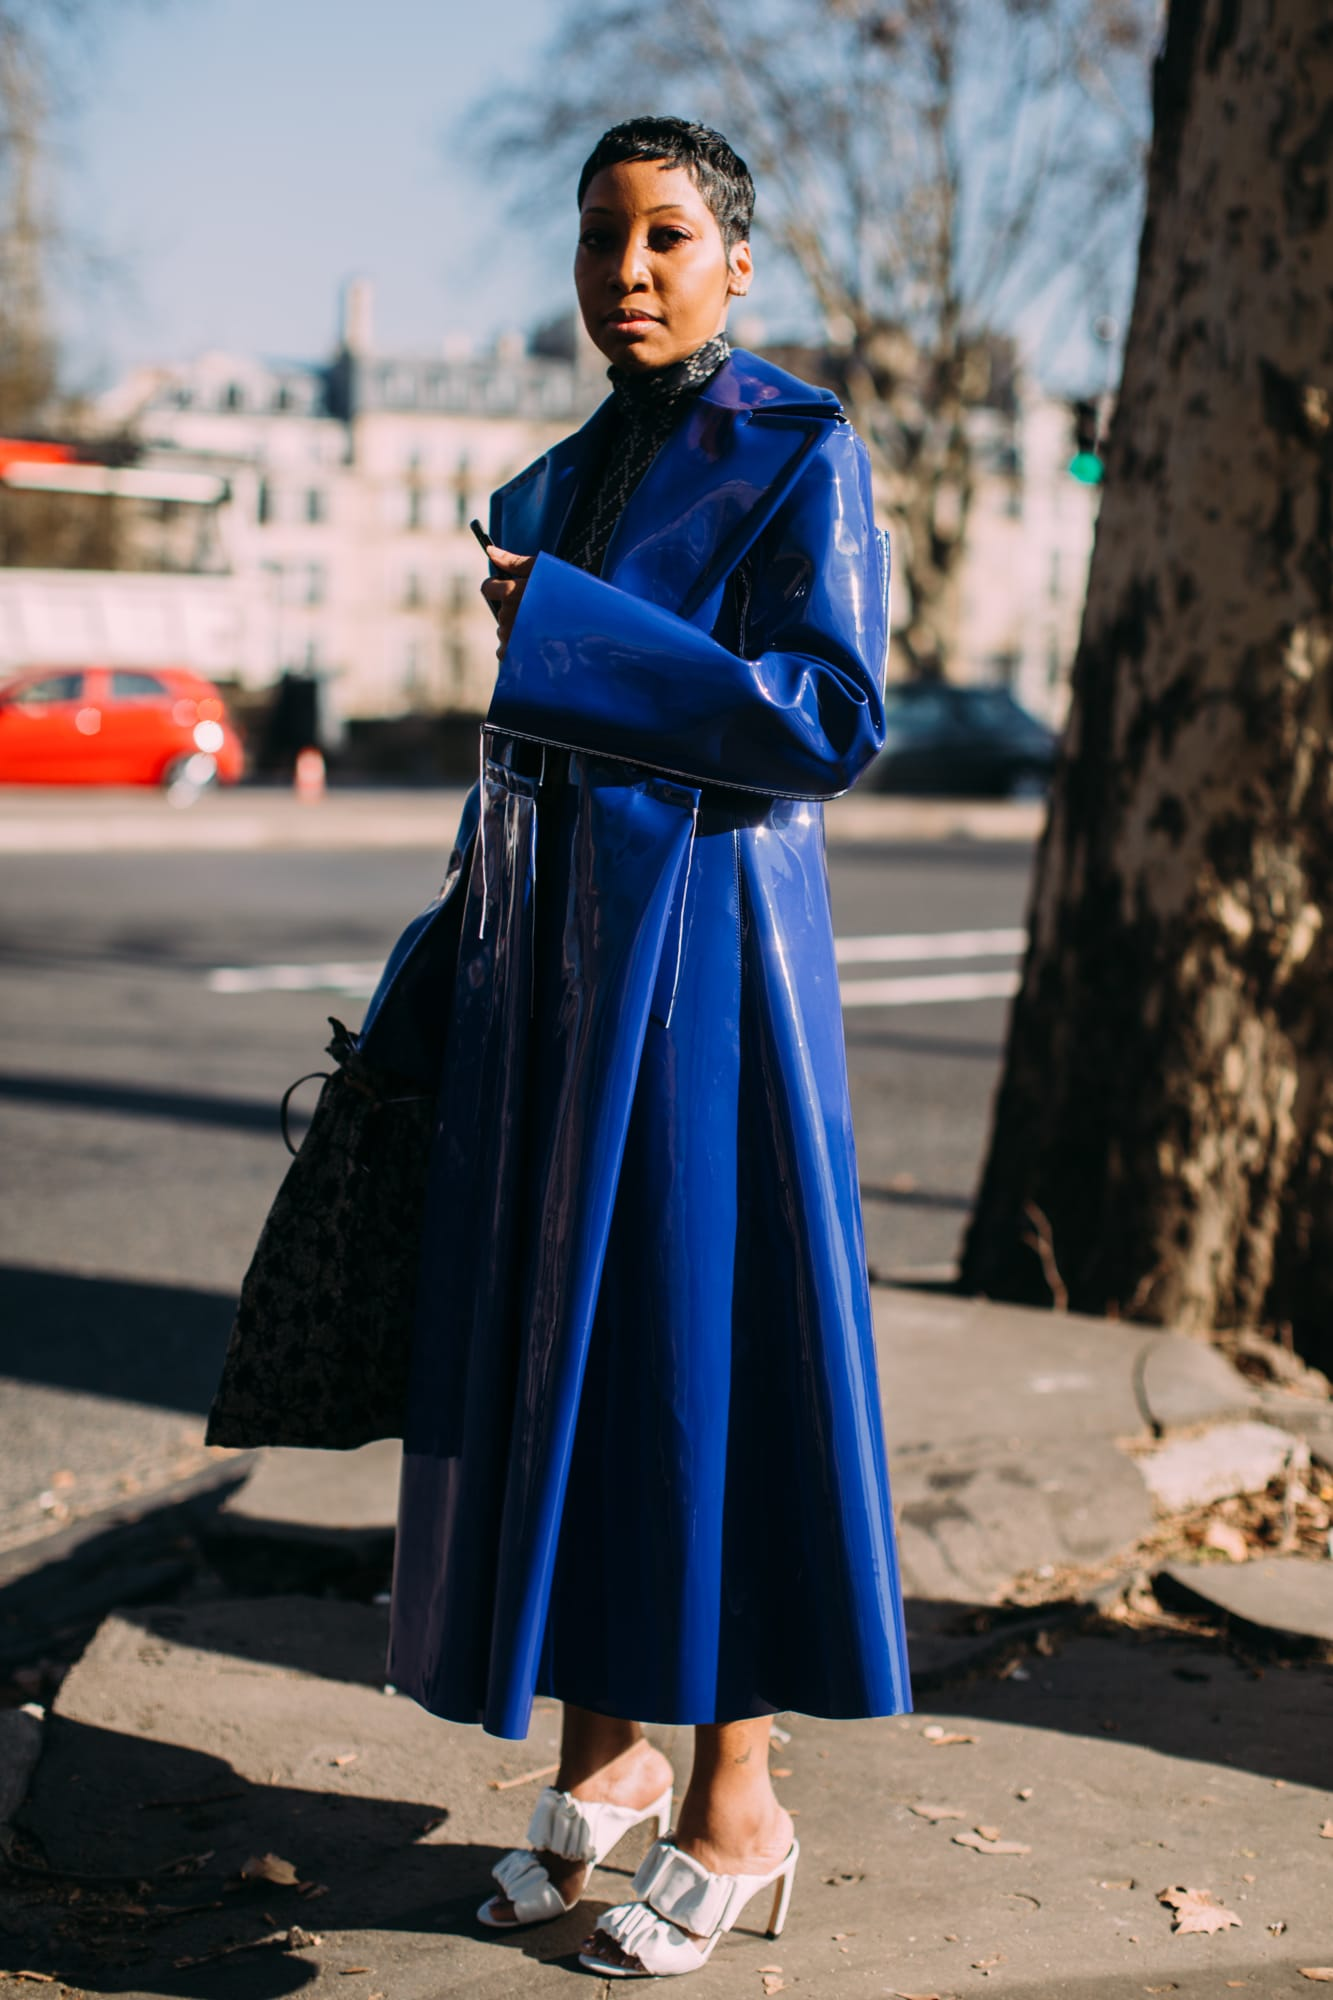 paris-fashion-week-fall-2019-street-style-day-2-51